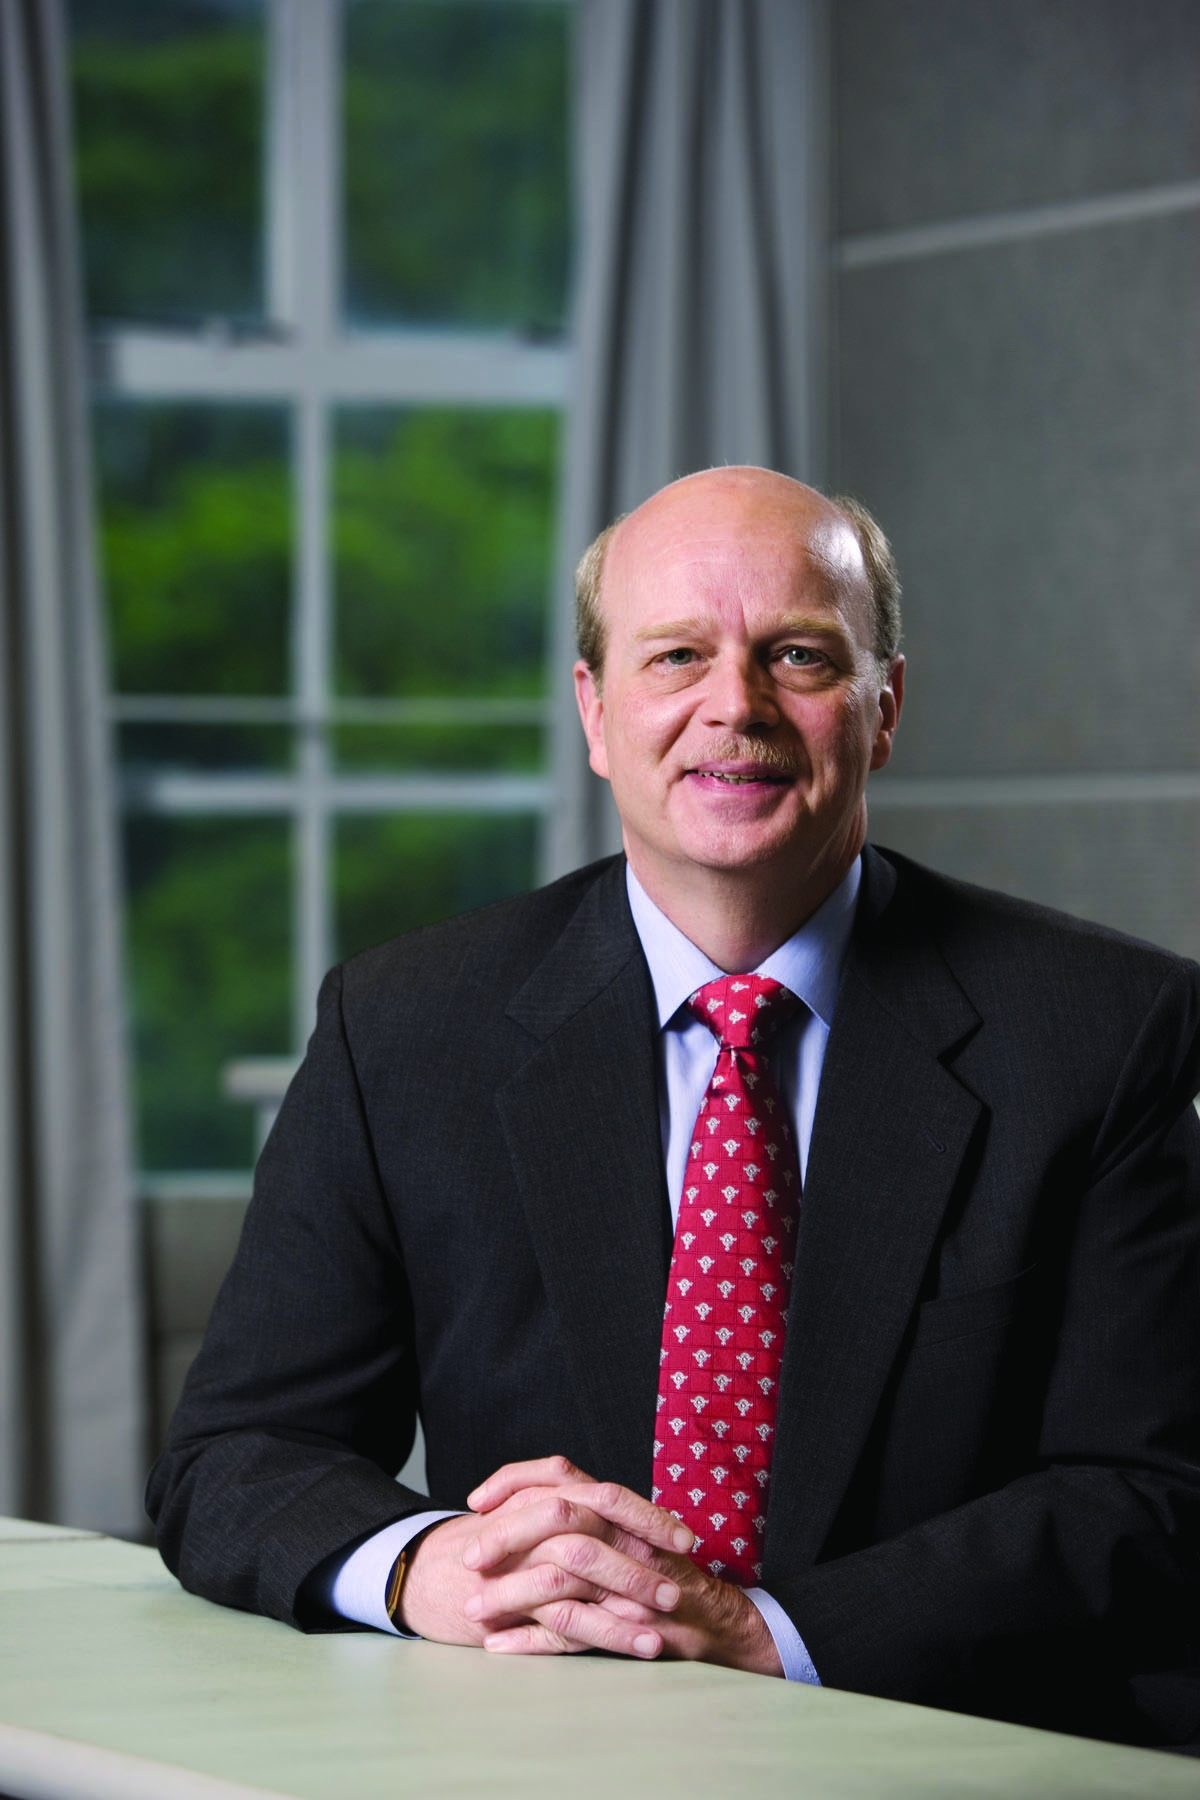 Prof. Michael J. Ferguson, Associate Dean of CUHK Business School and Director of MBA Program